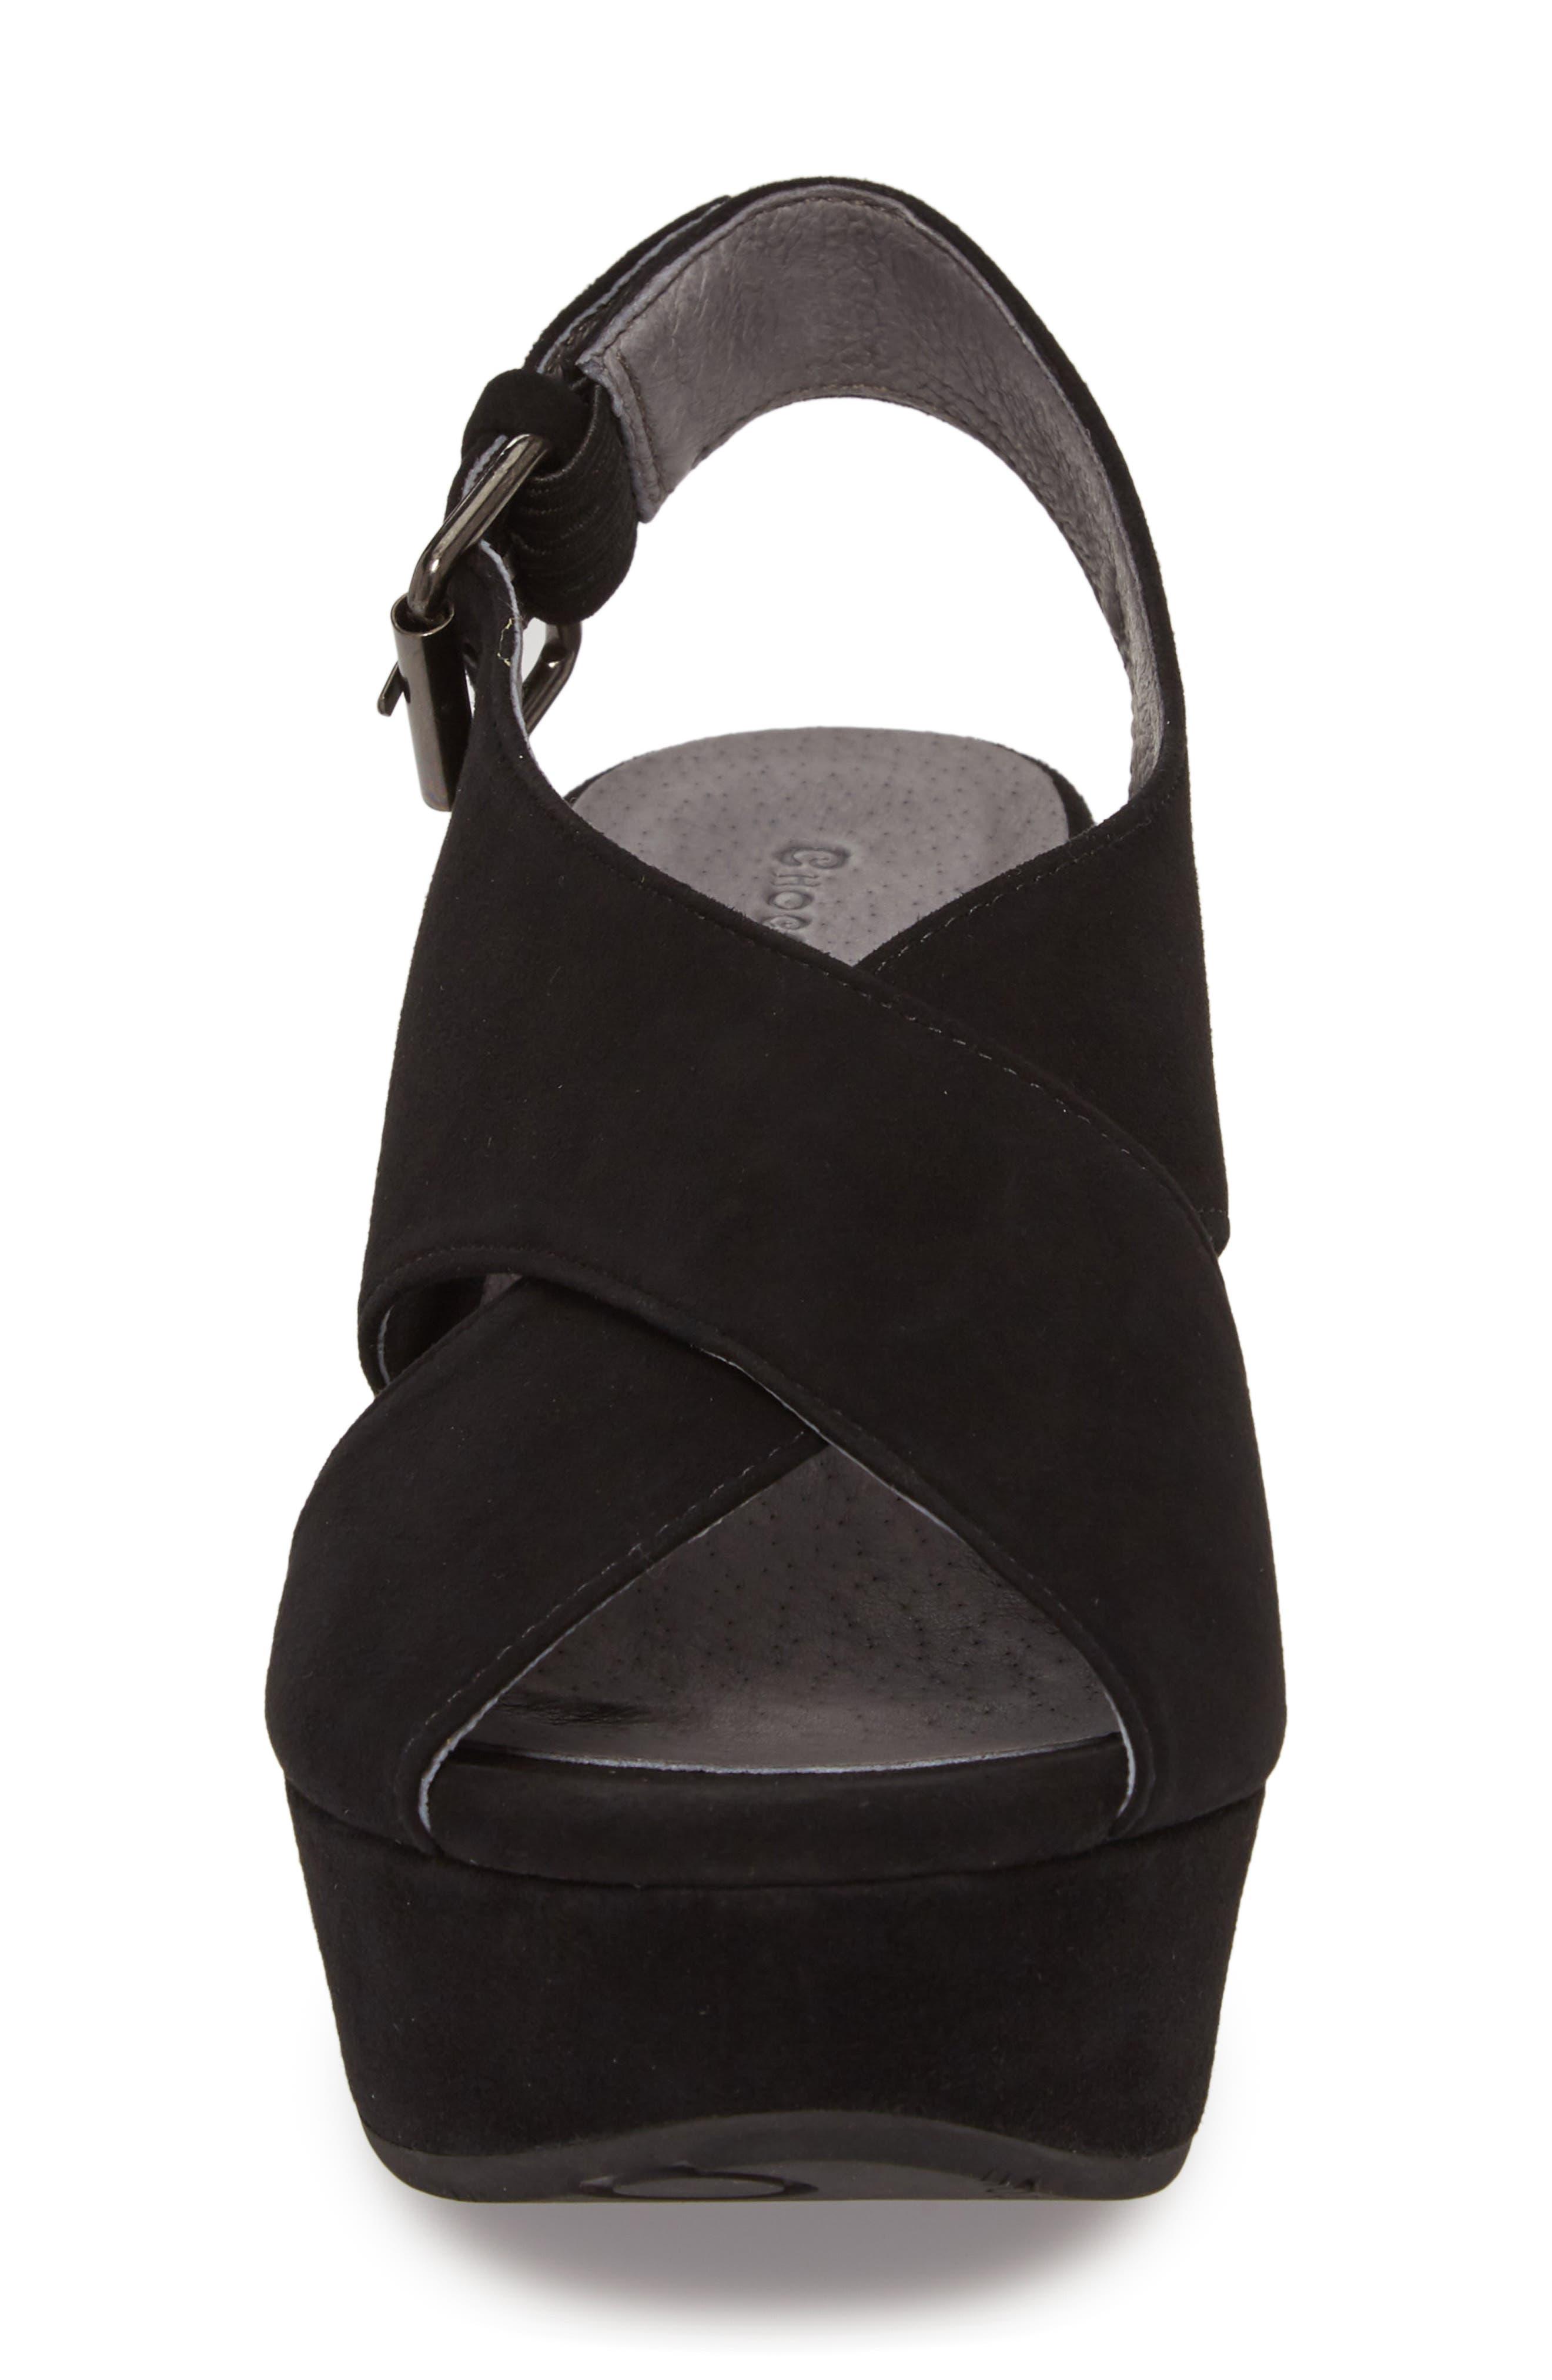 Wim Platform Wedge Sandal,                             Alternate thumbnail 4, color,                             BLACK SUEDE